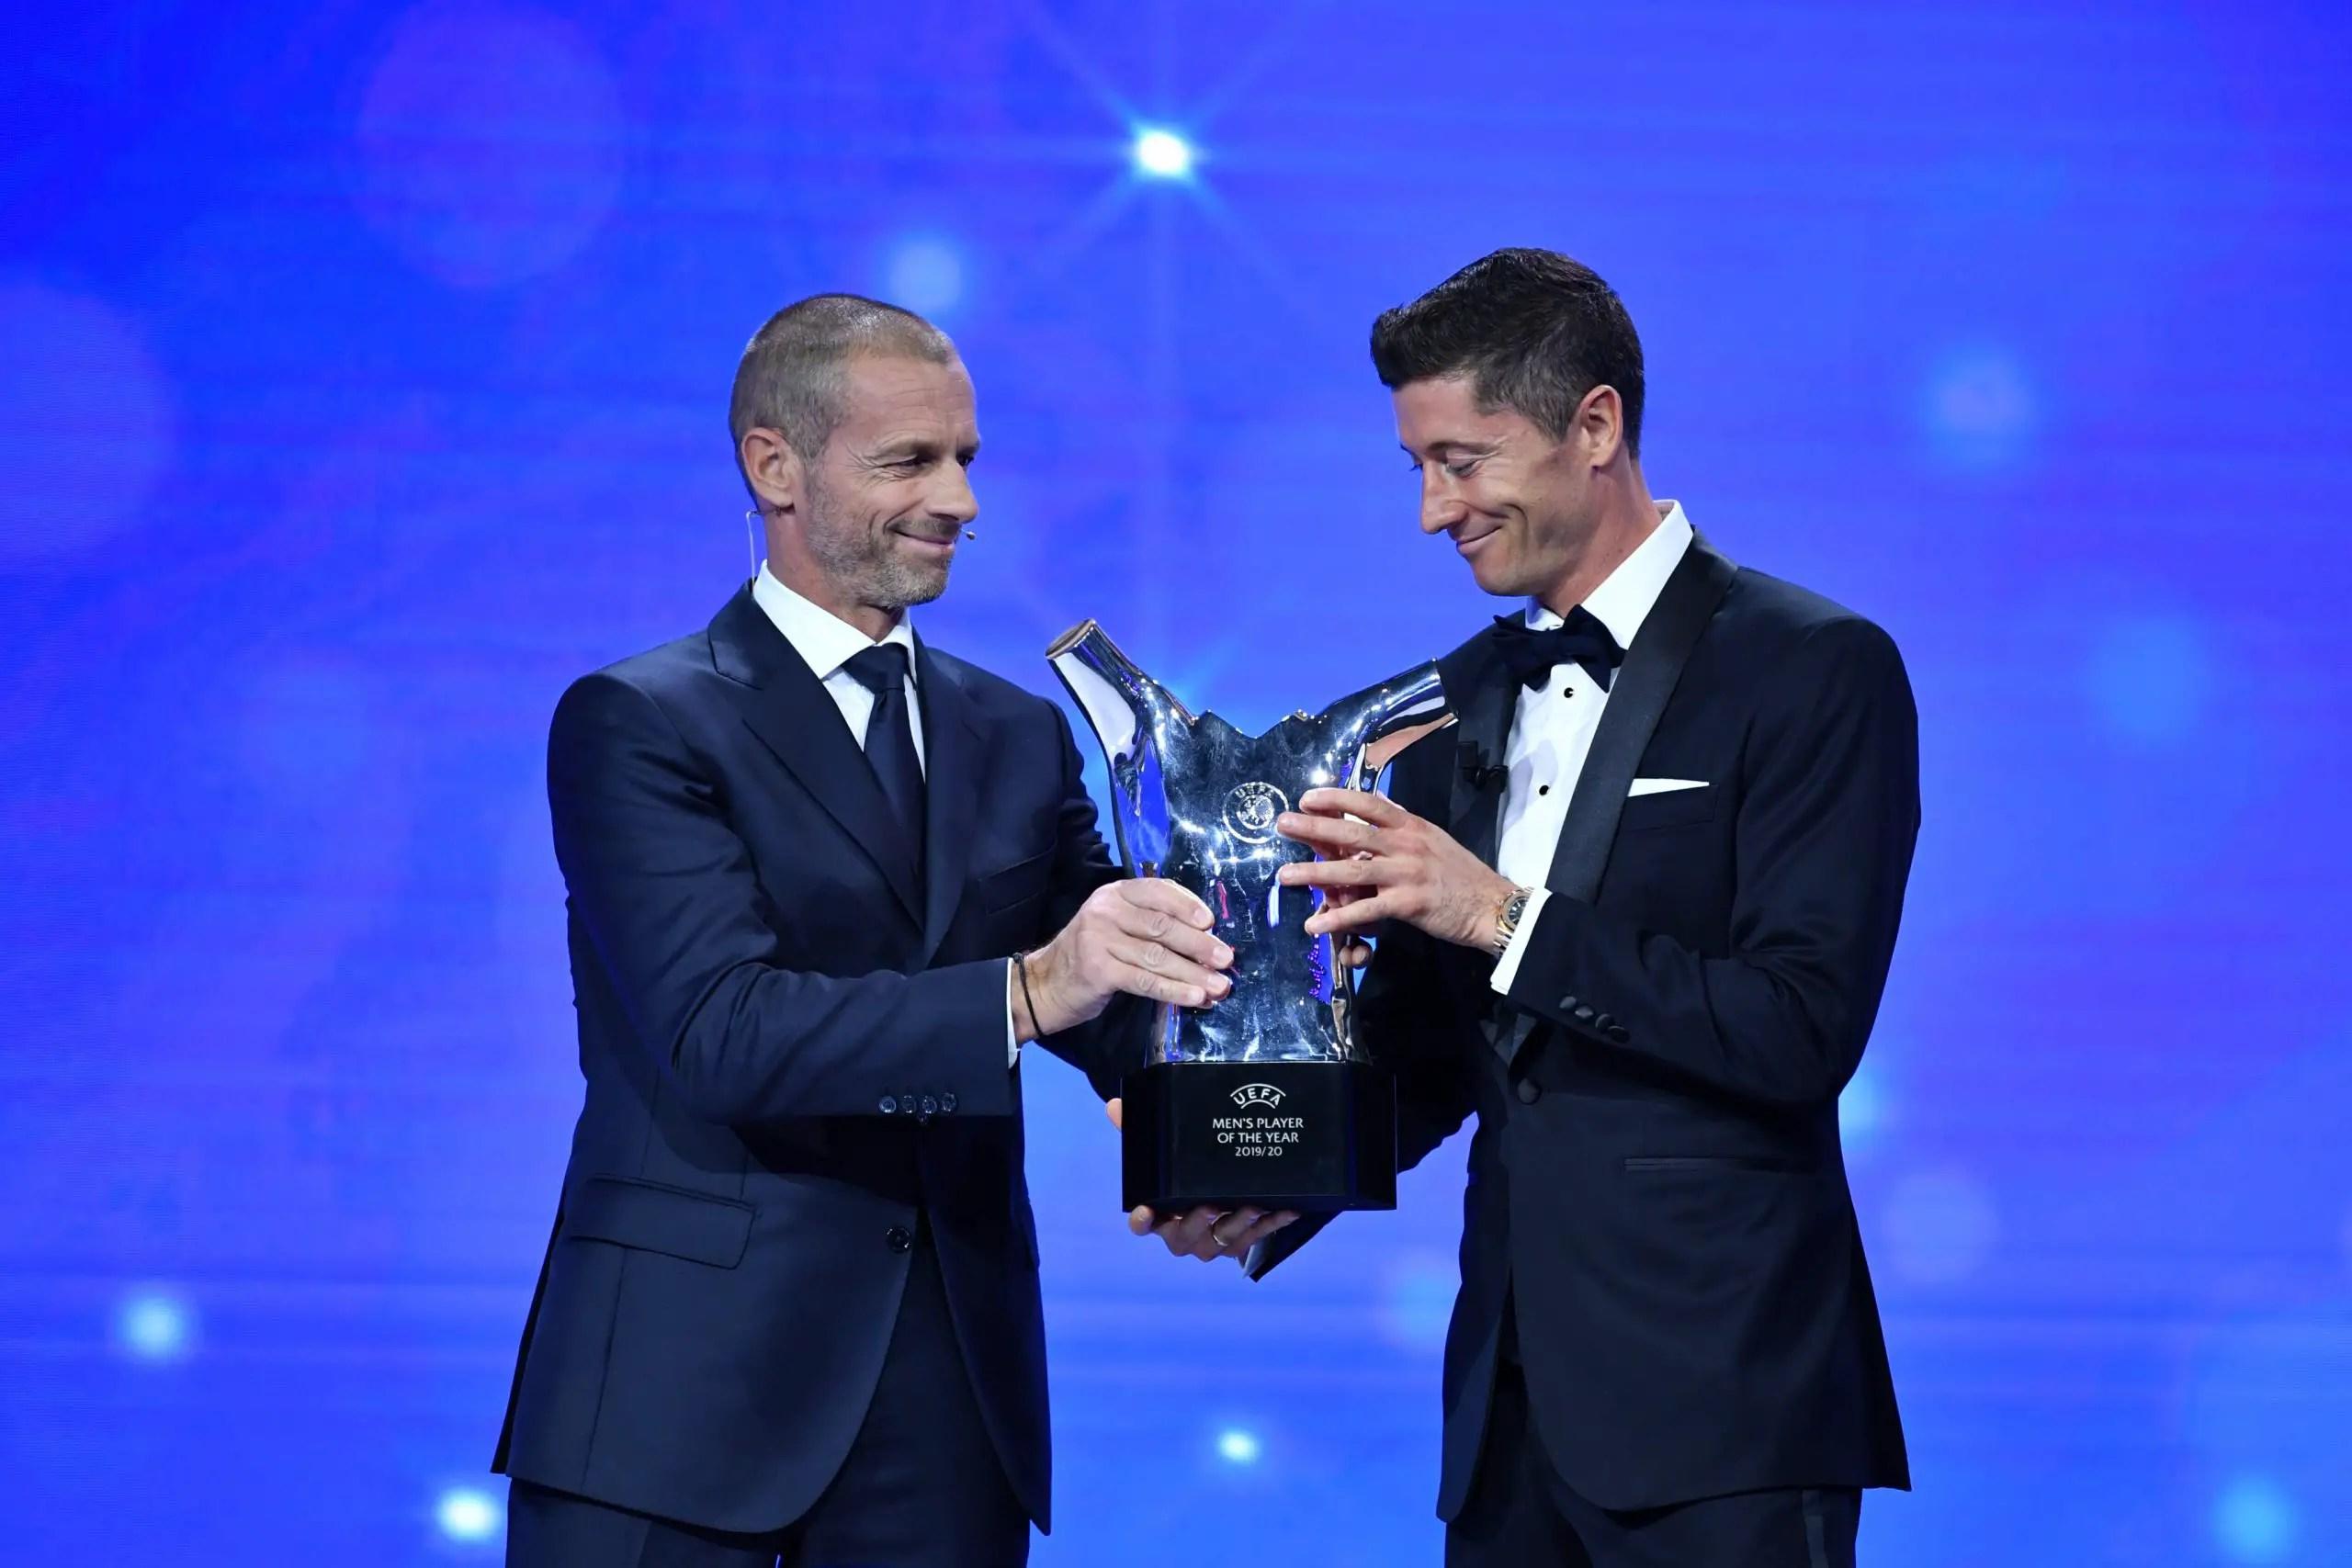 Bayern Munich Star Lewandowski Voted UEFA Men's Player Of The Year